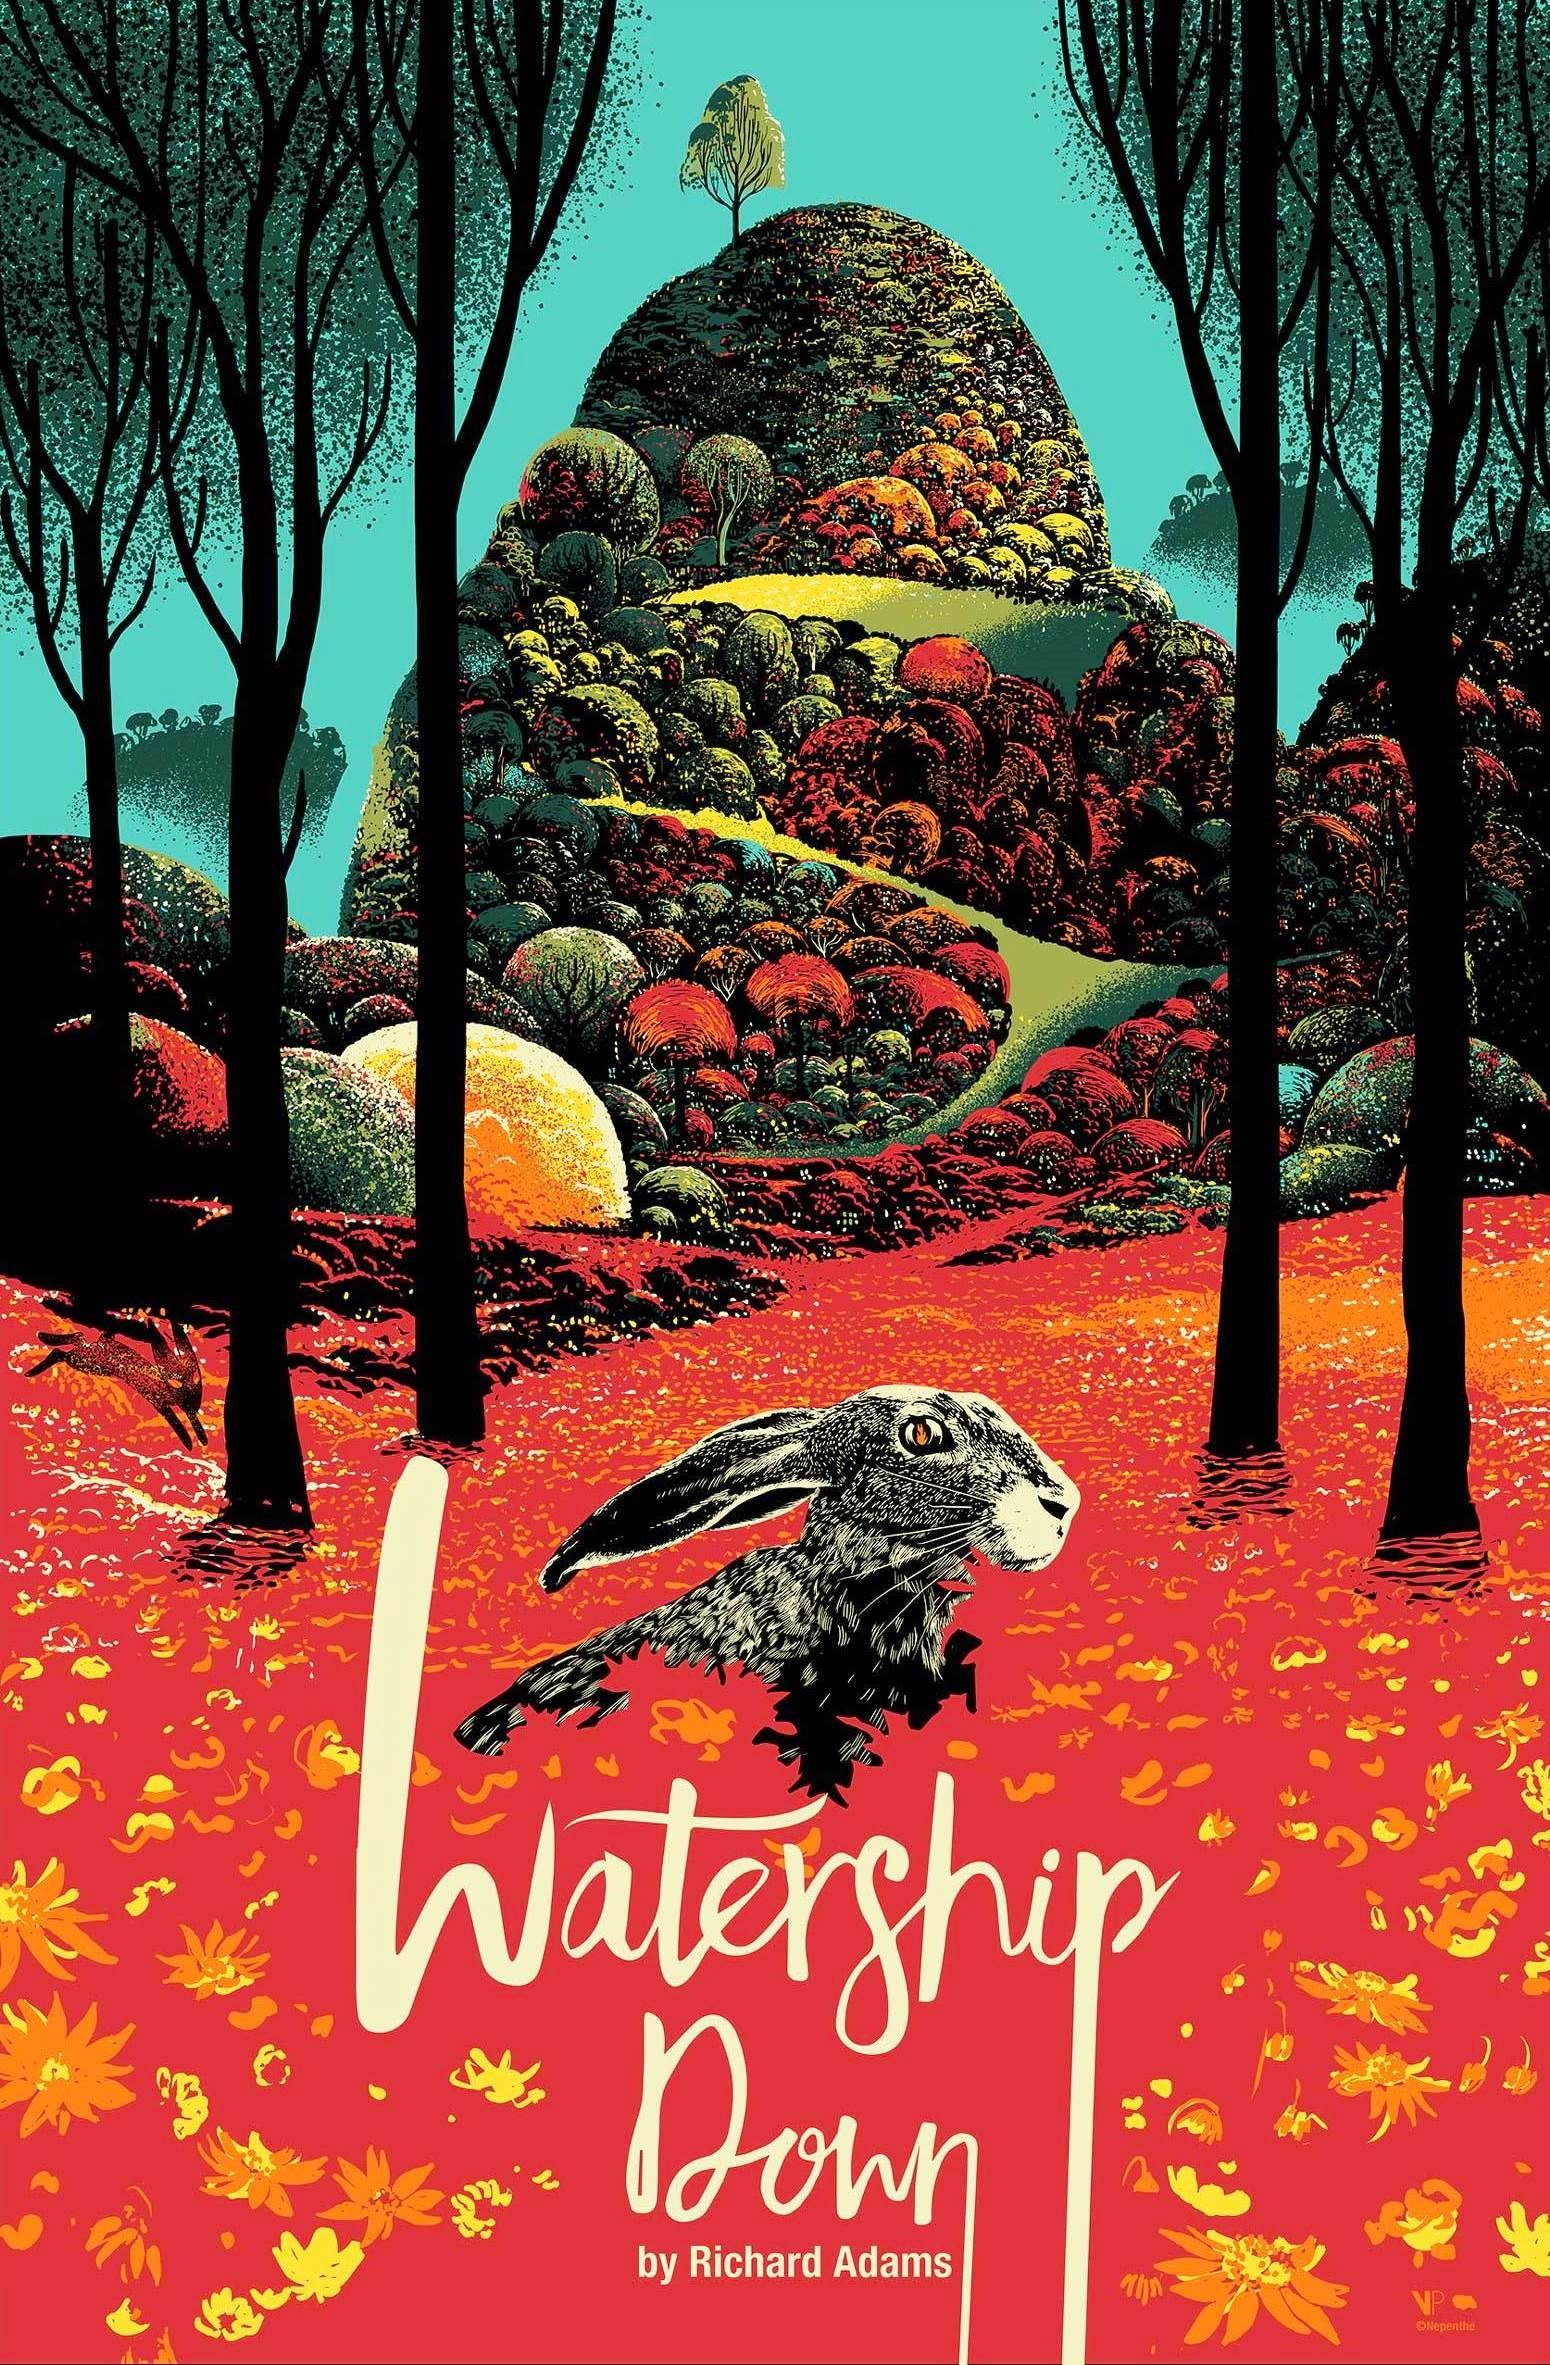 Watership Down (1978) in 2019.